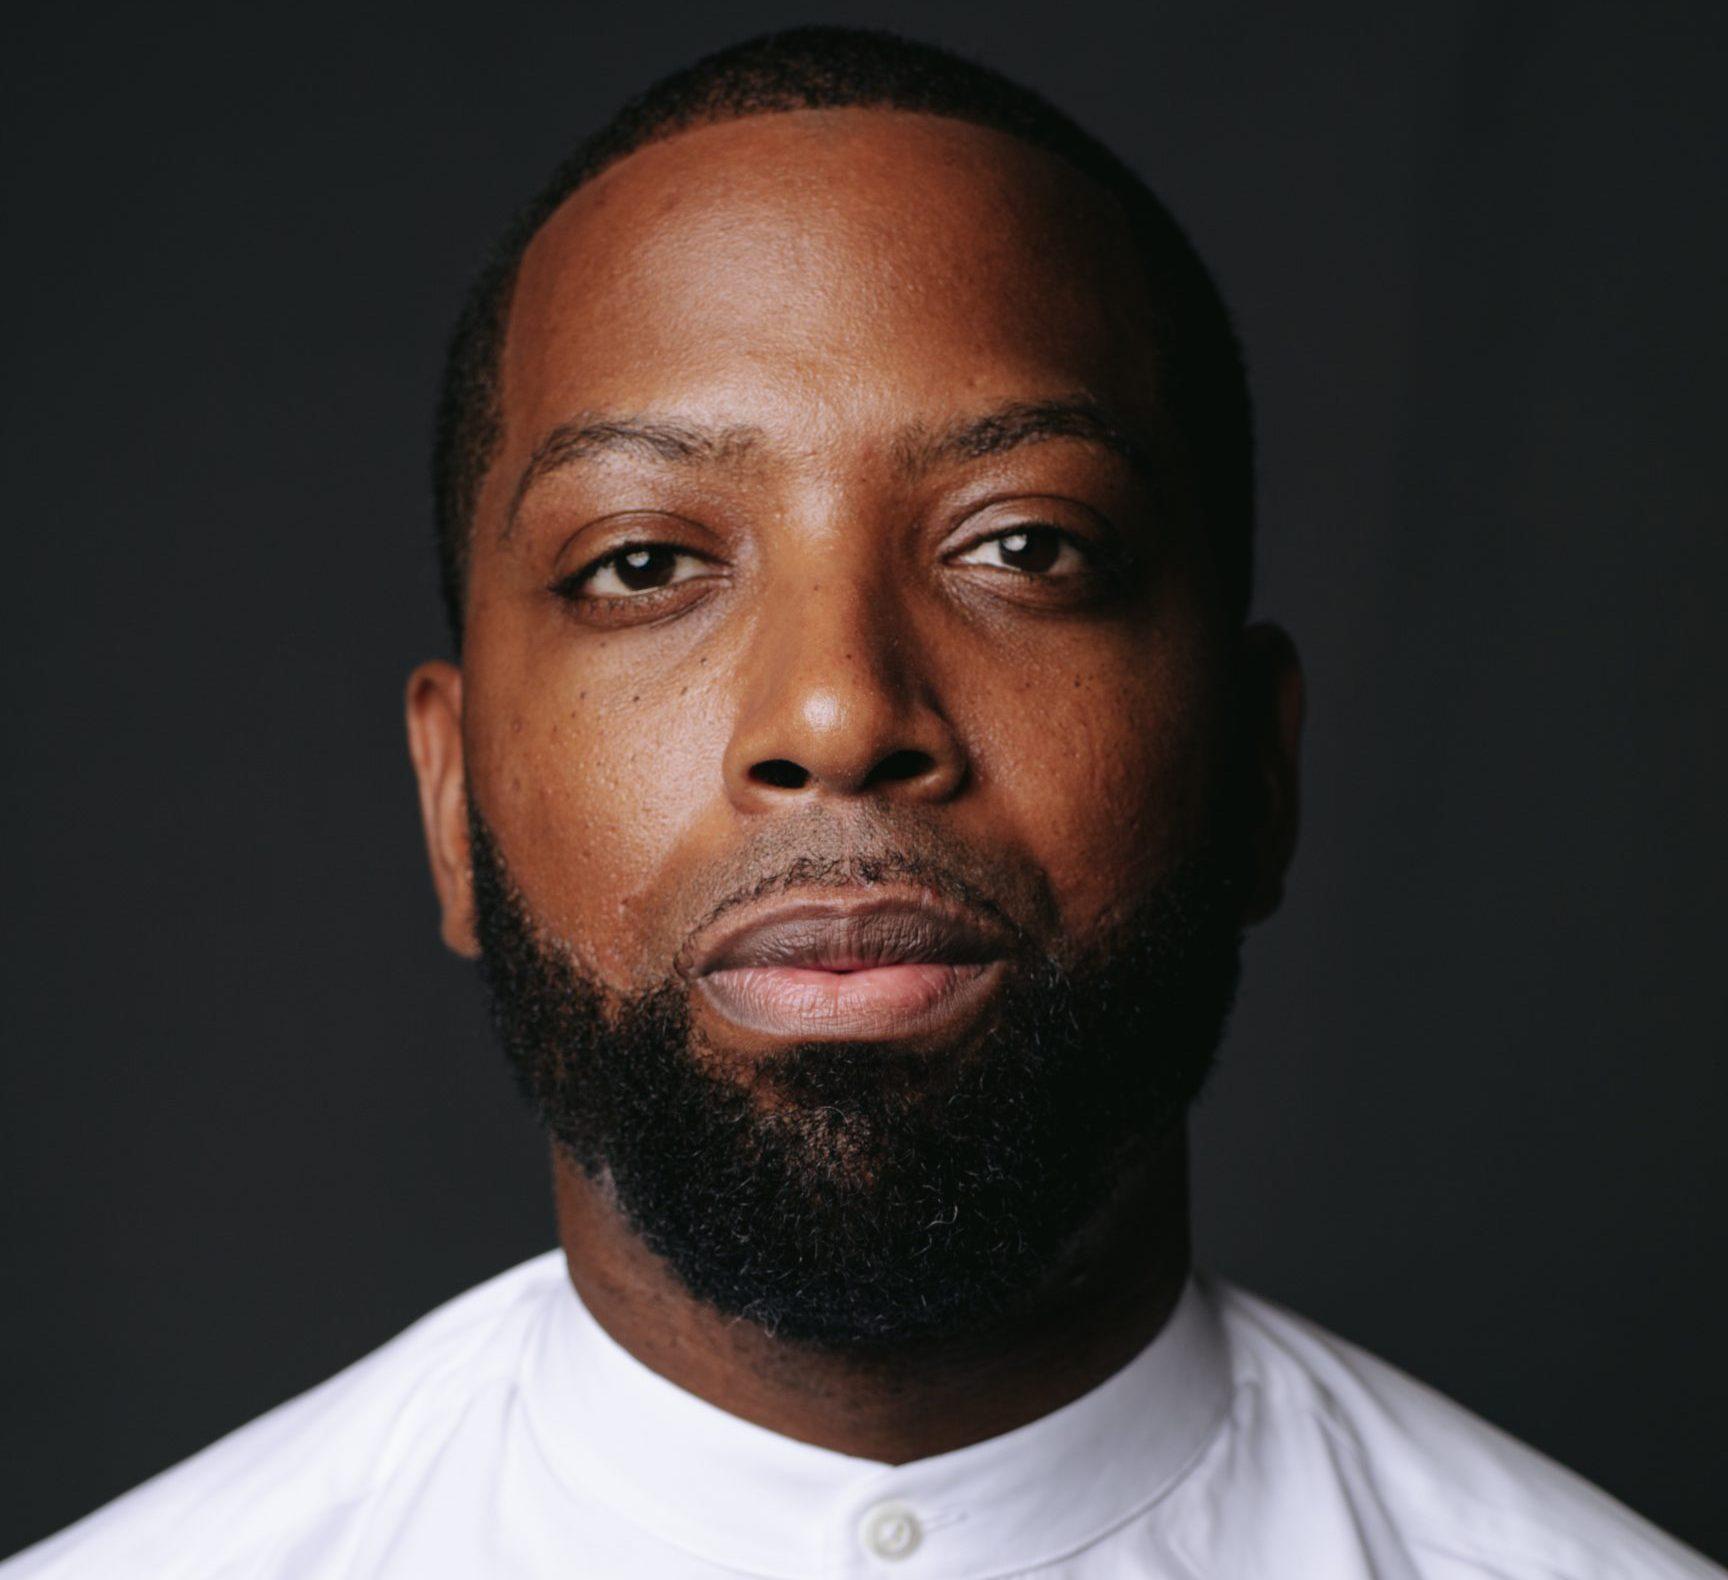 Black entrepreneur Tristan Walker